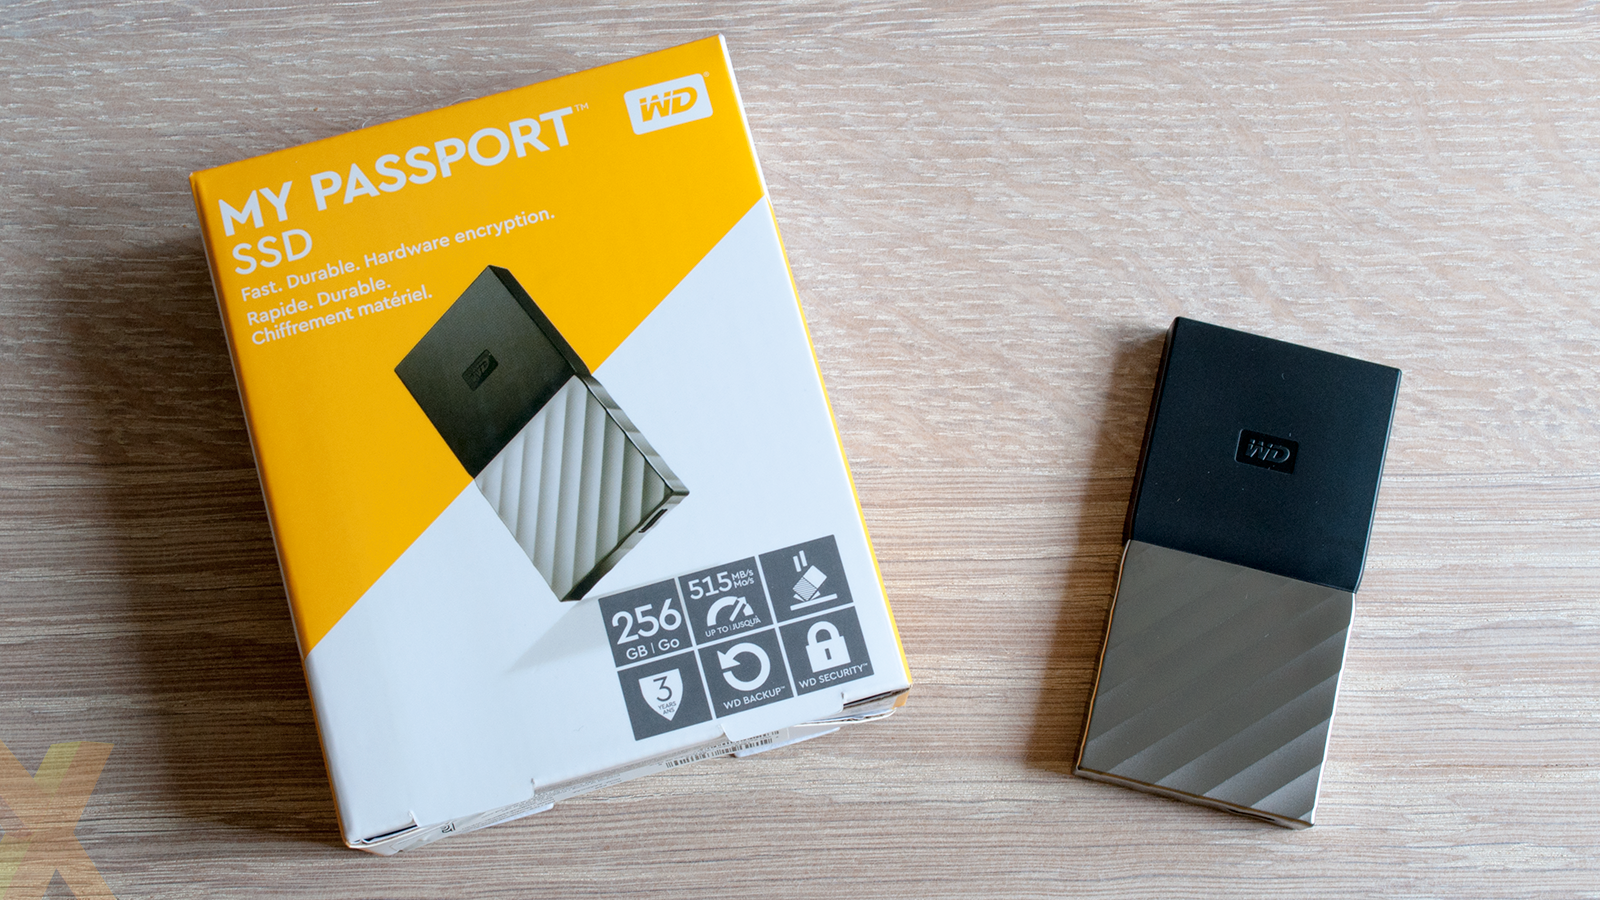 Review: WD My Passport SSD (256GB) - Storage - HEXUS net